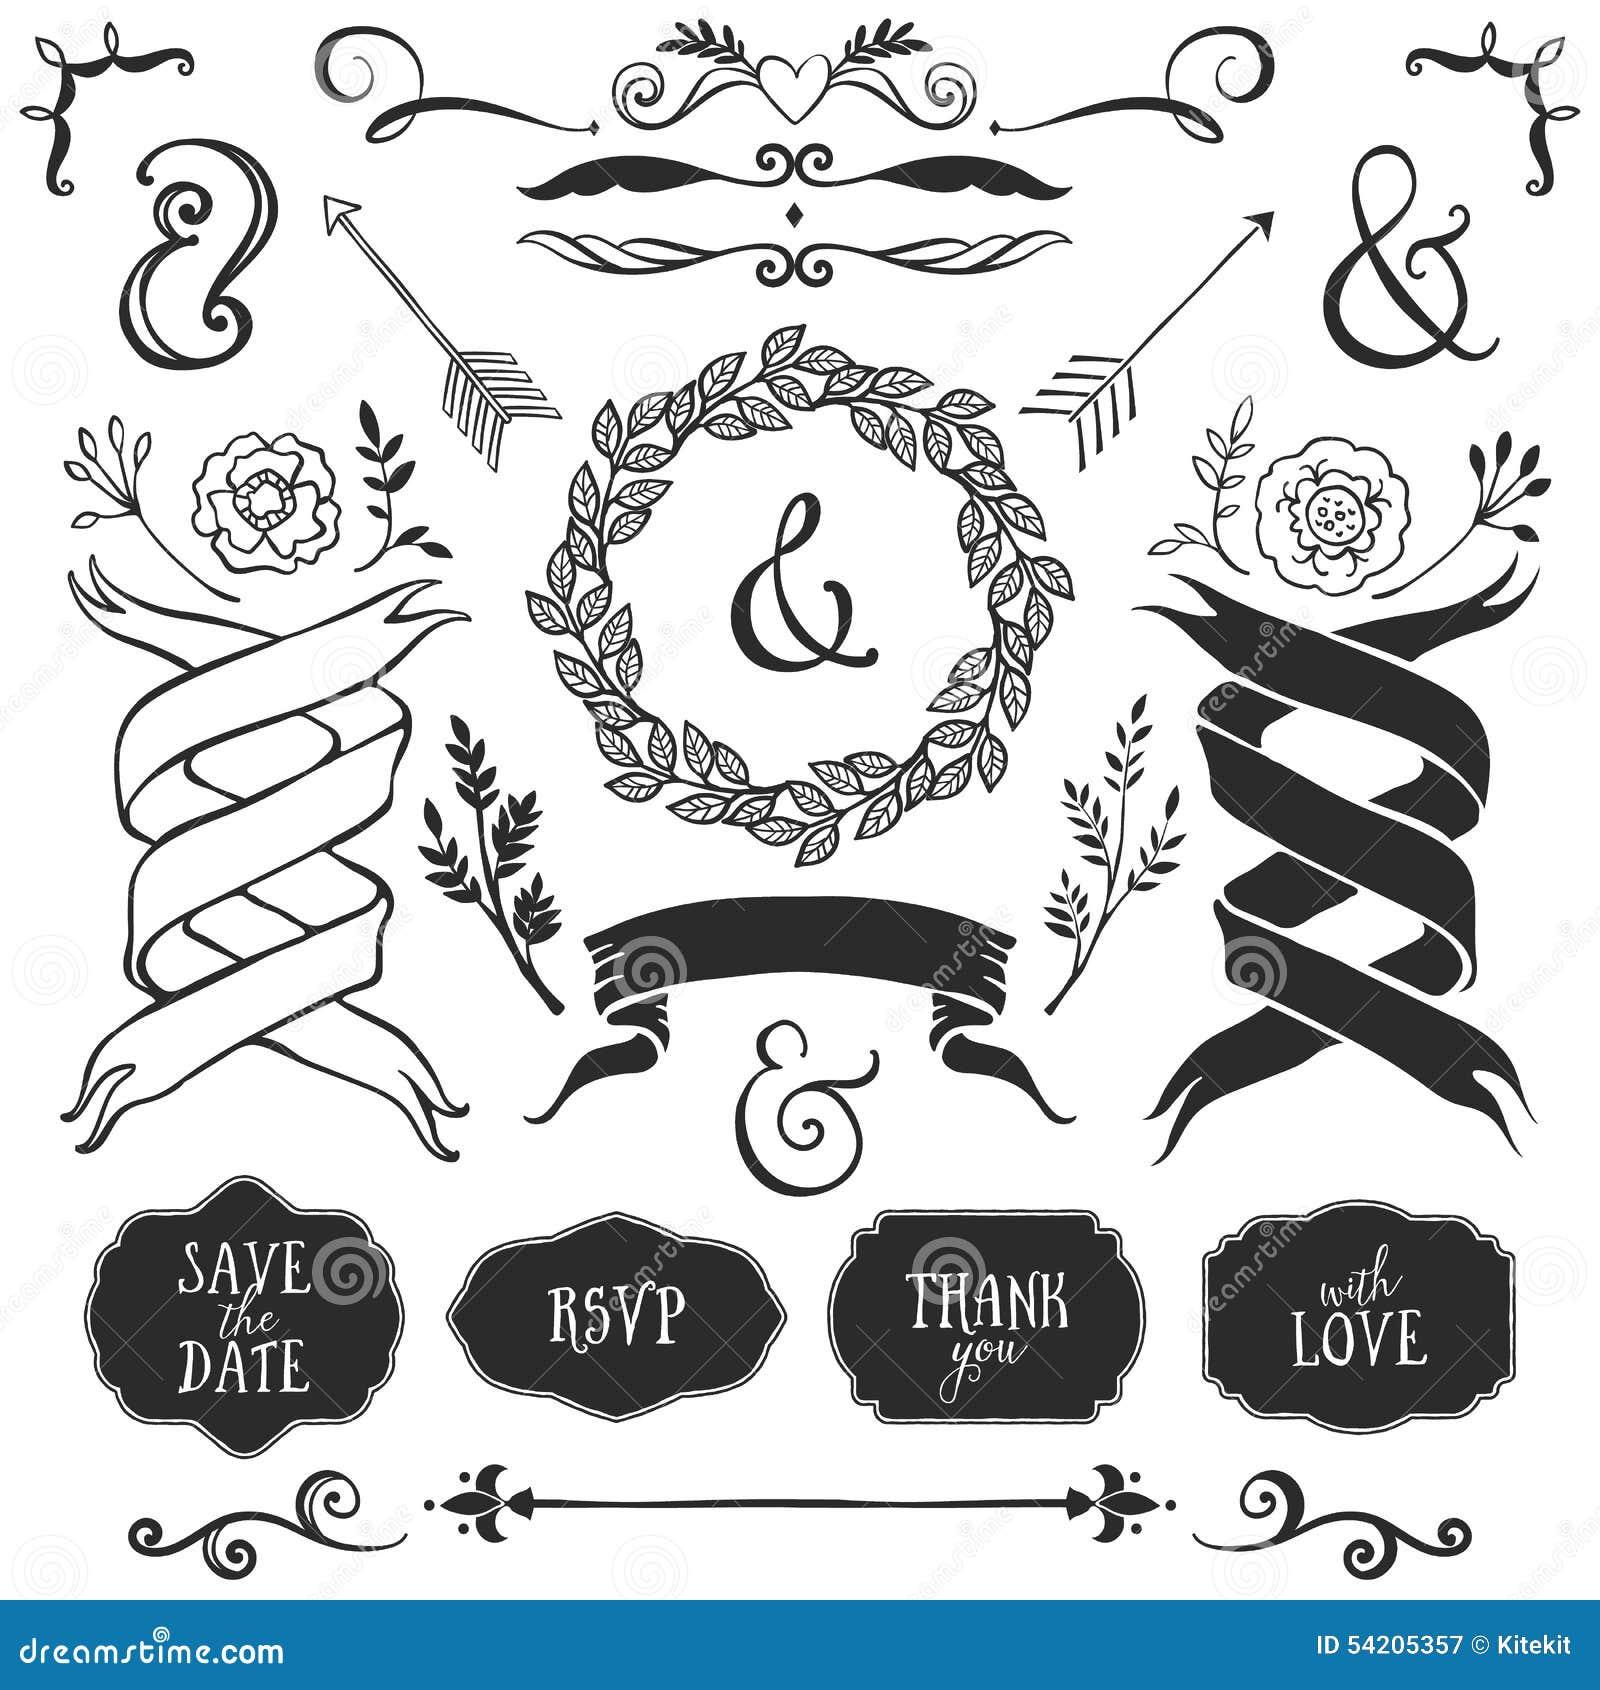 Vintage decorative elements with lettering hand drawn vector vintage decorative elements with lettering hand drawn vector junglespirit Choice Image